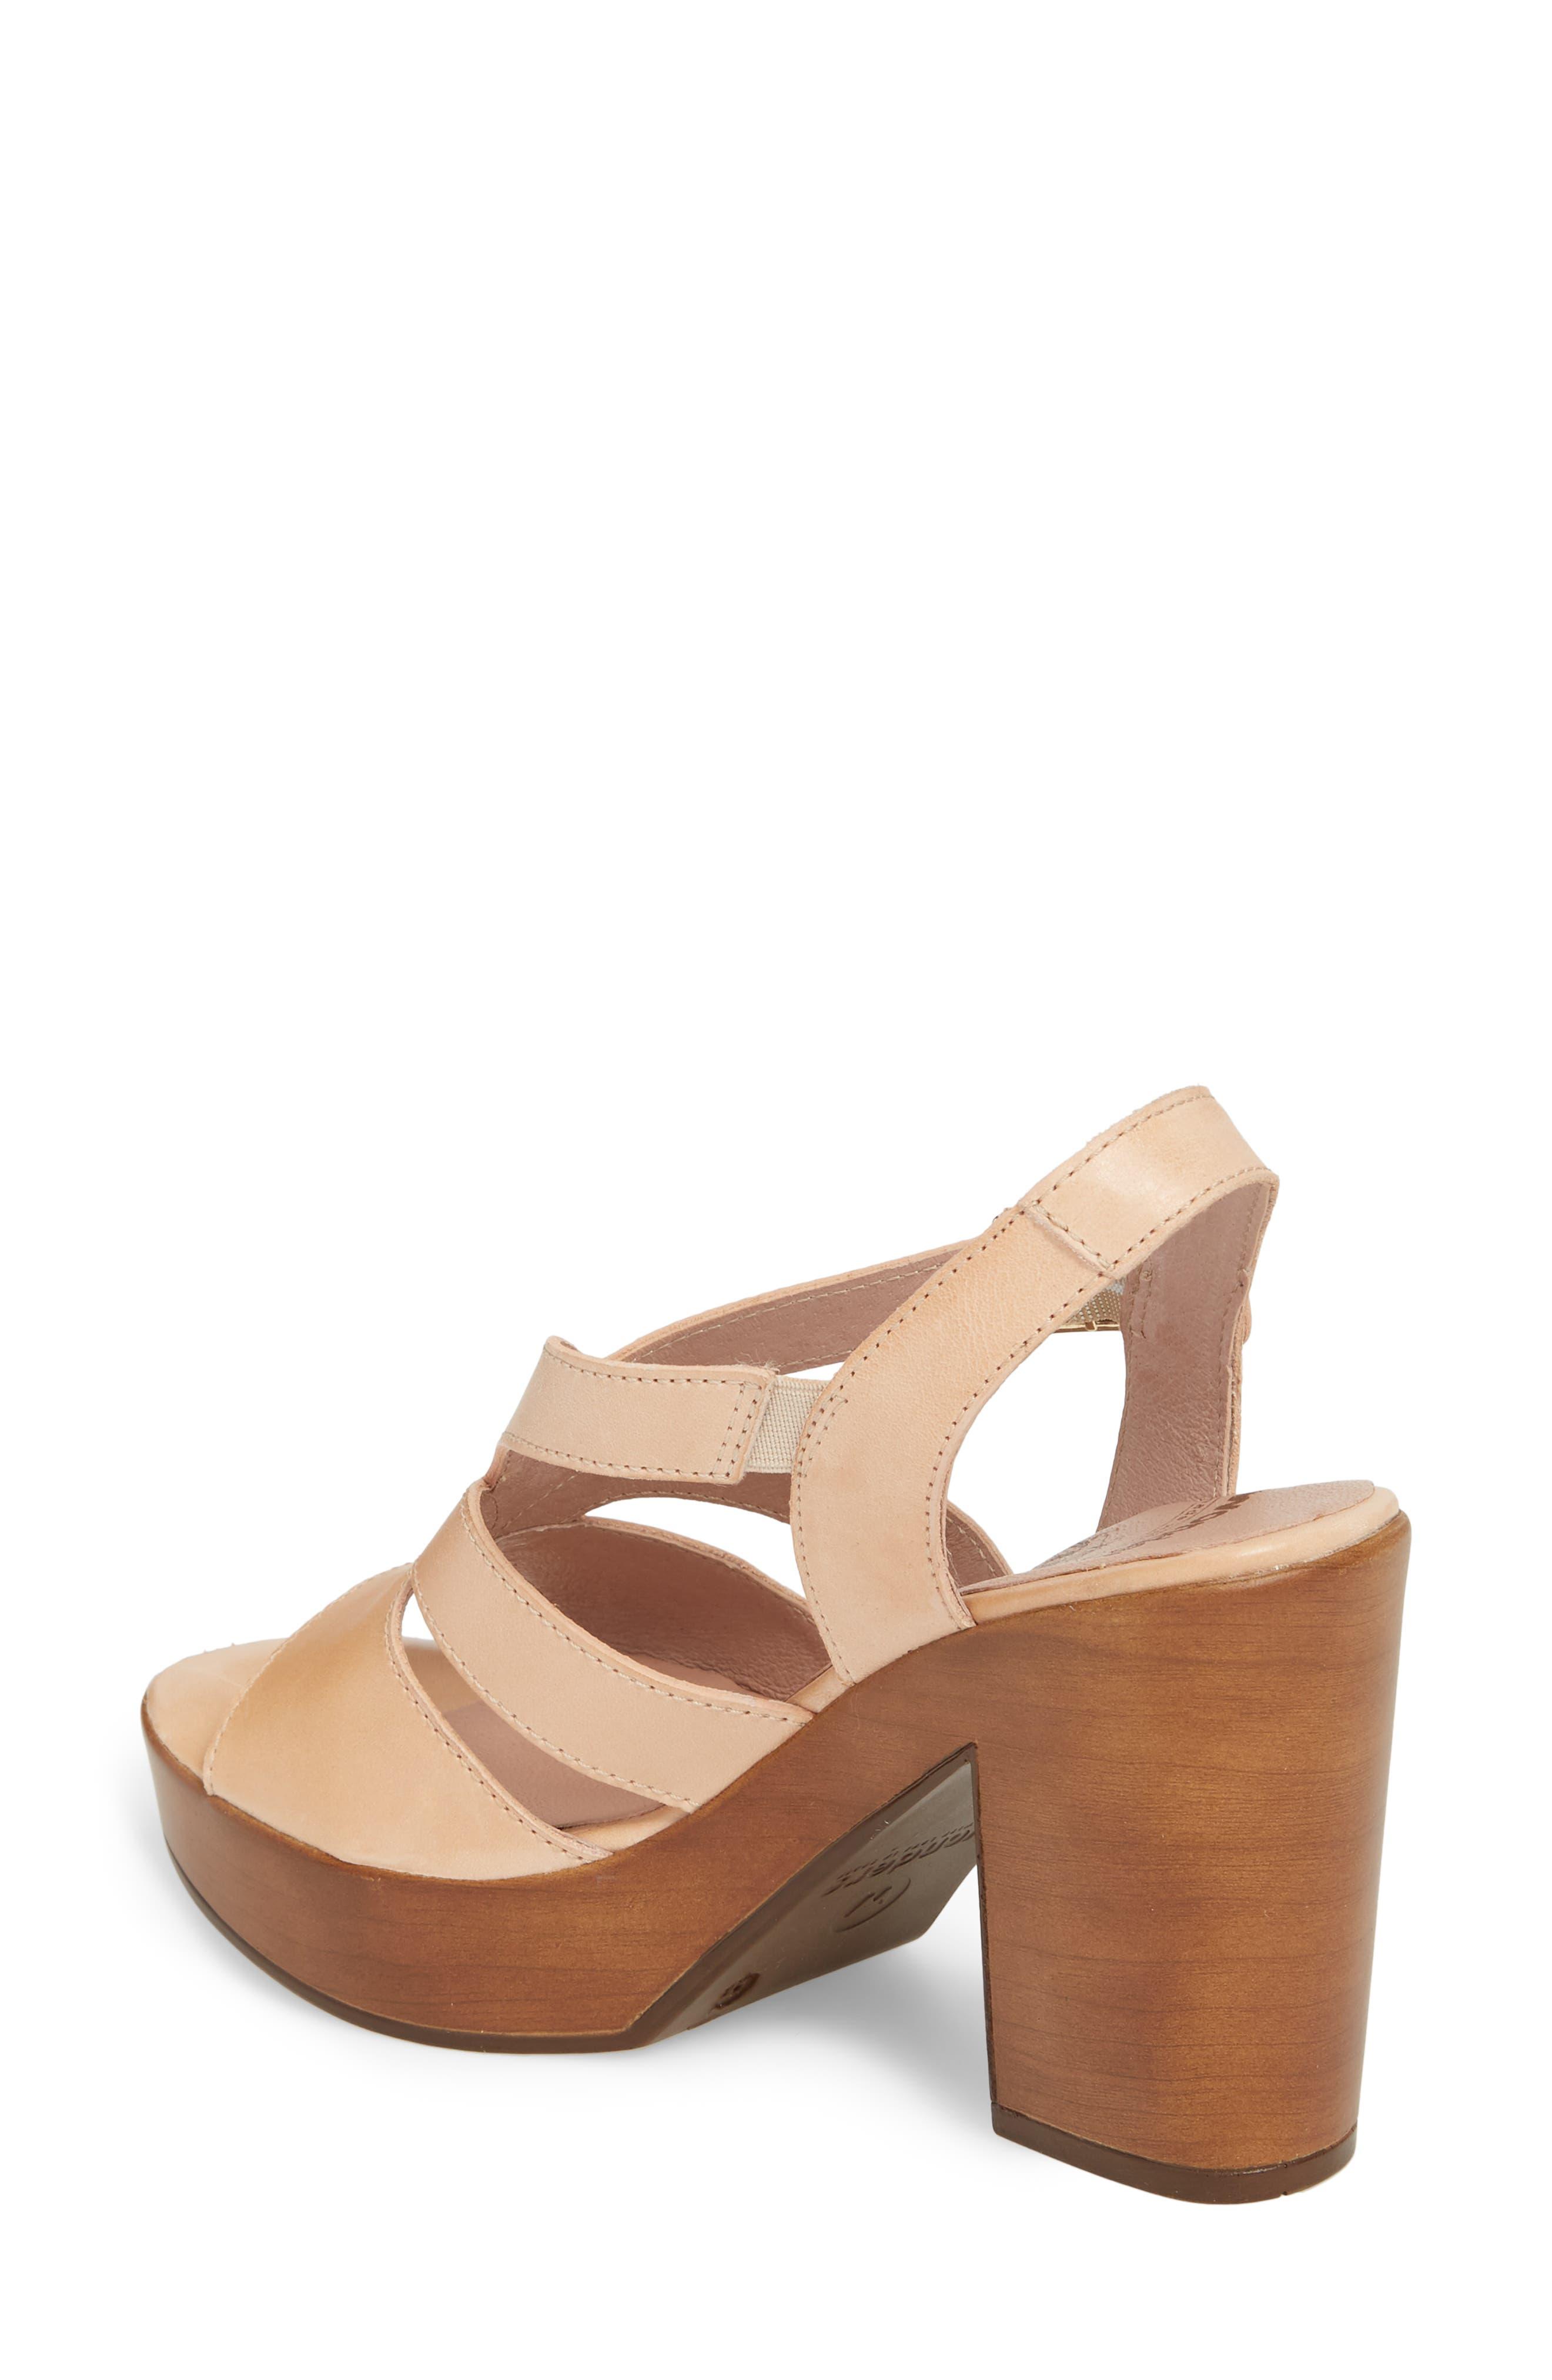 V-Strap Platform Sandal,                             Alternate thumbnail 2, color,                             Palo Leather